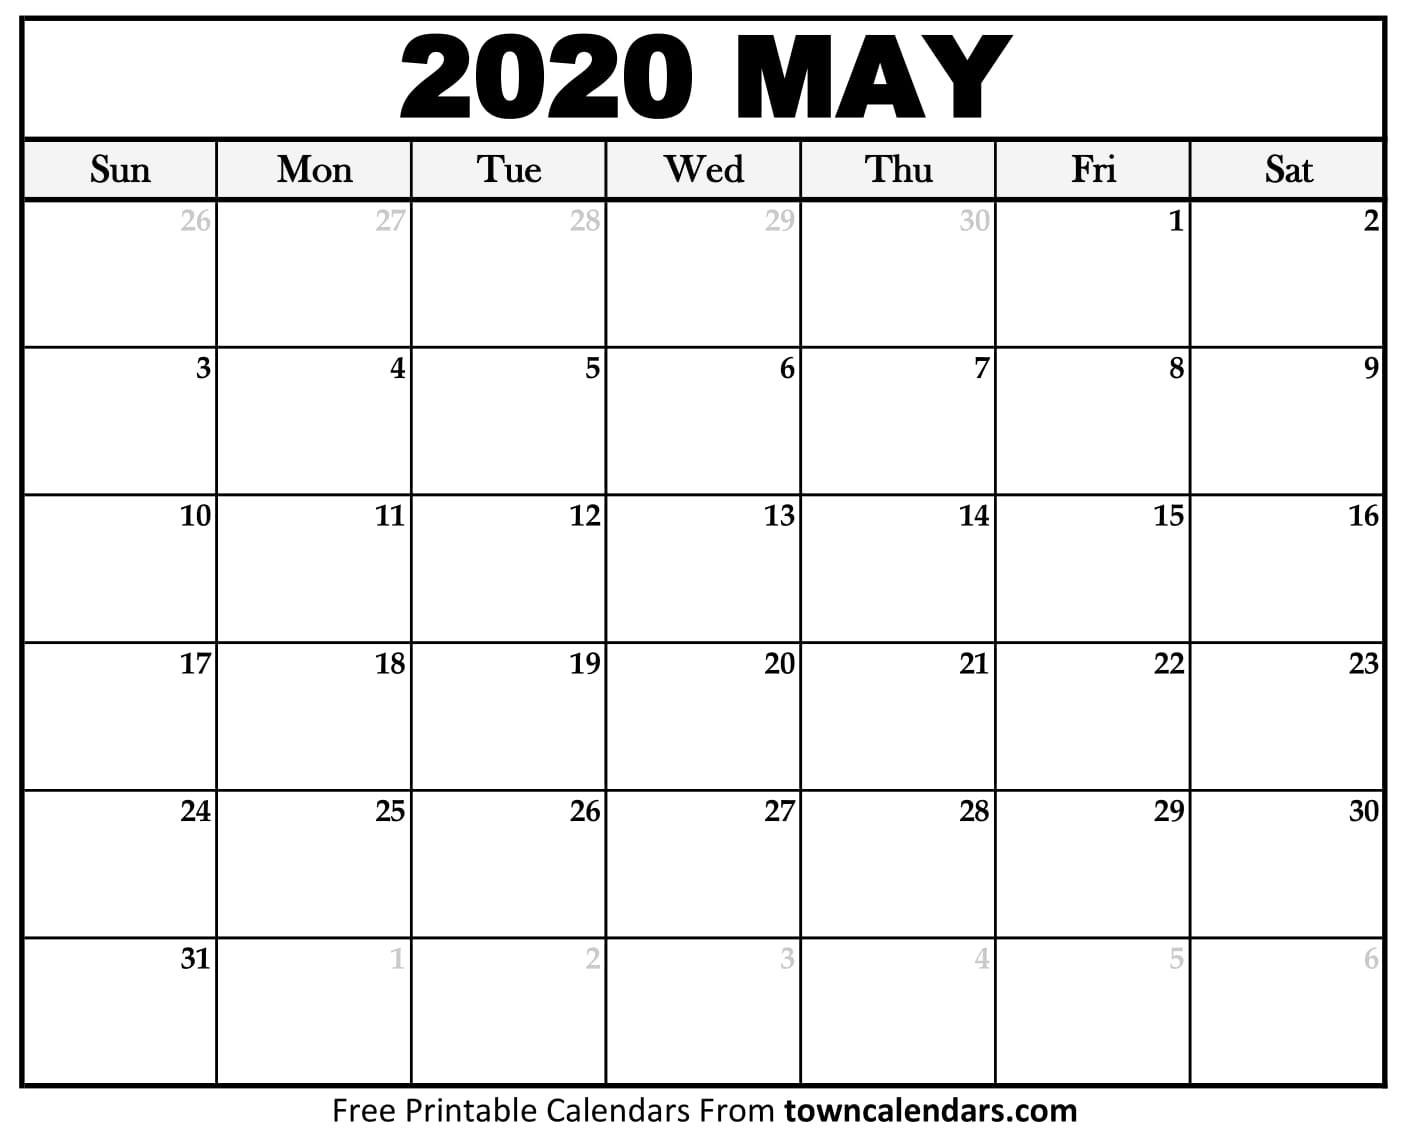 Printable May 2020 Calendar - Towncalendars  May 2020 Calendar Printable